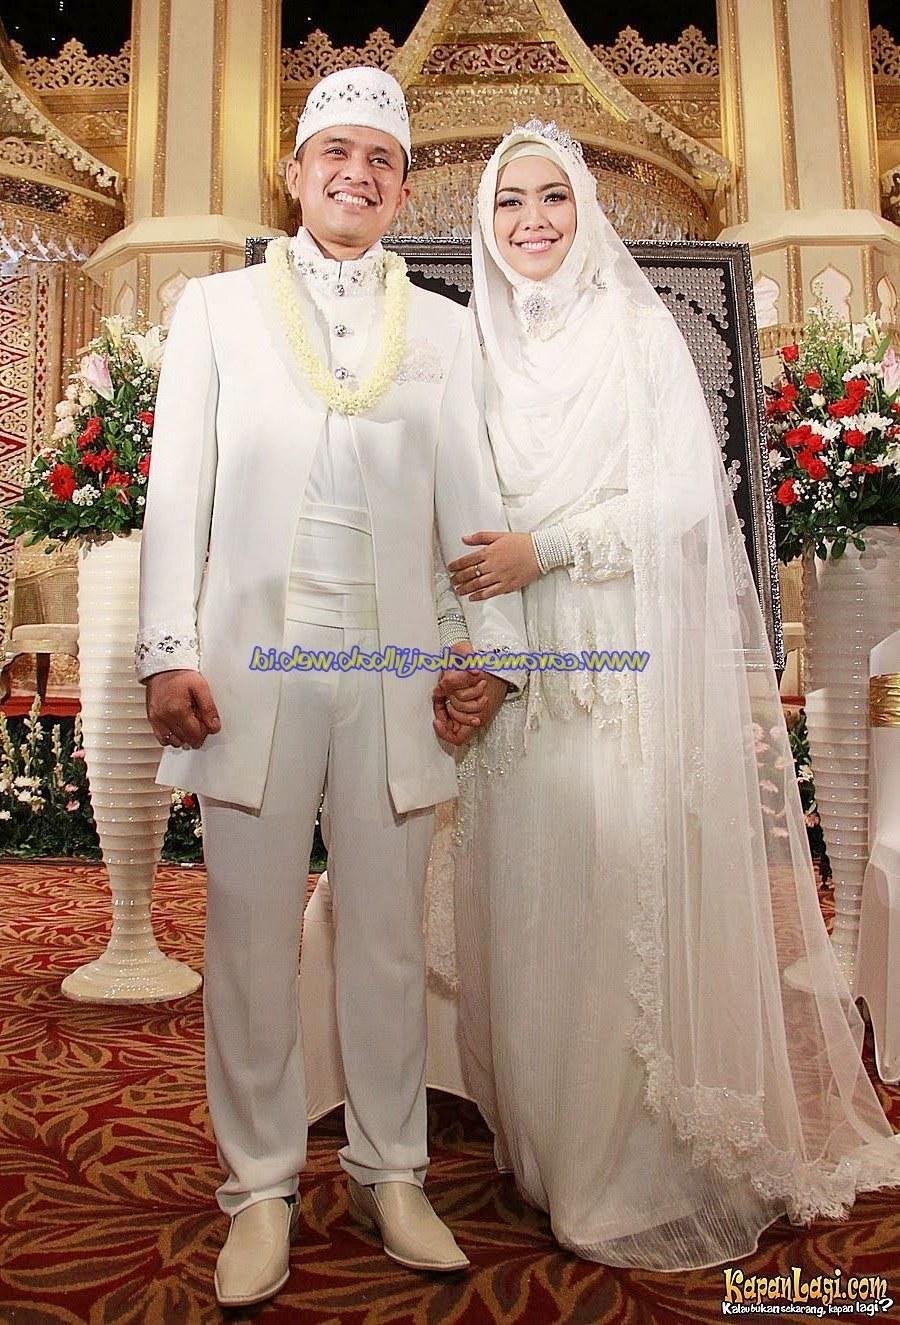 Ide Dress Pernikahan Muslimah E9dx Baju Pengantin Muslimah Modern Terbaru 17 Di 2019